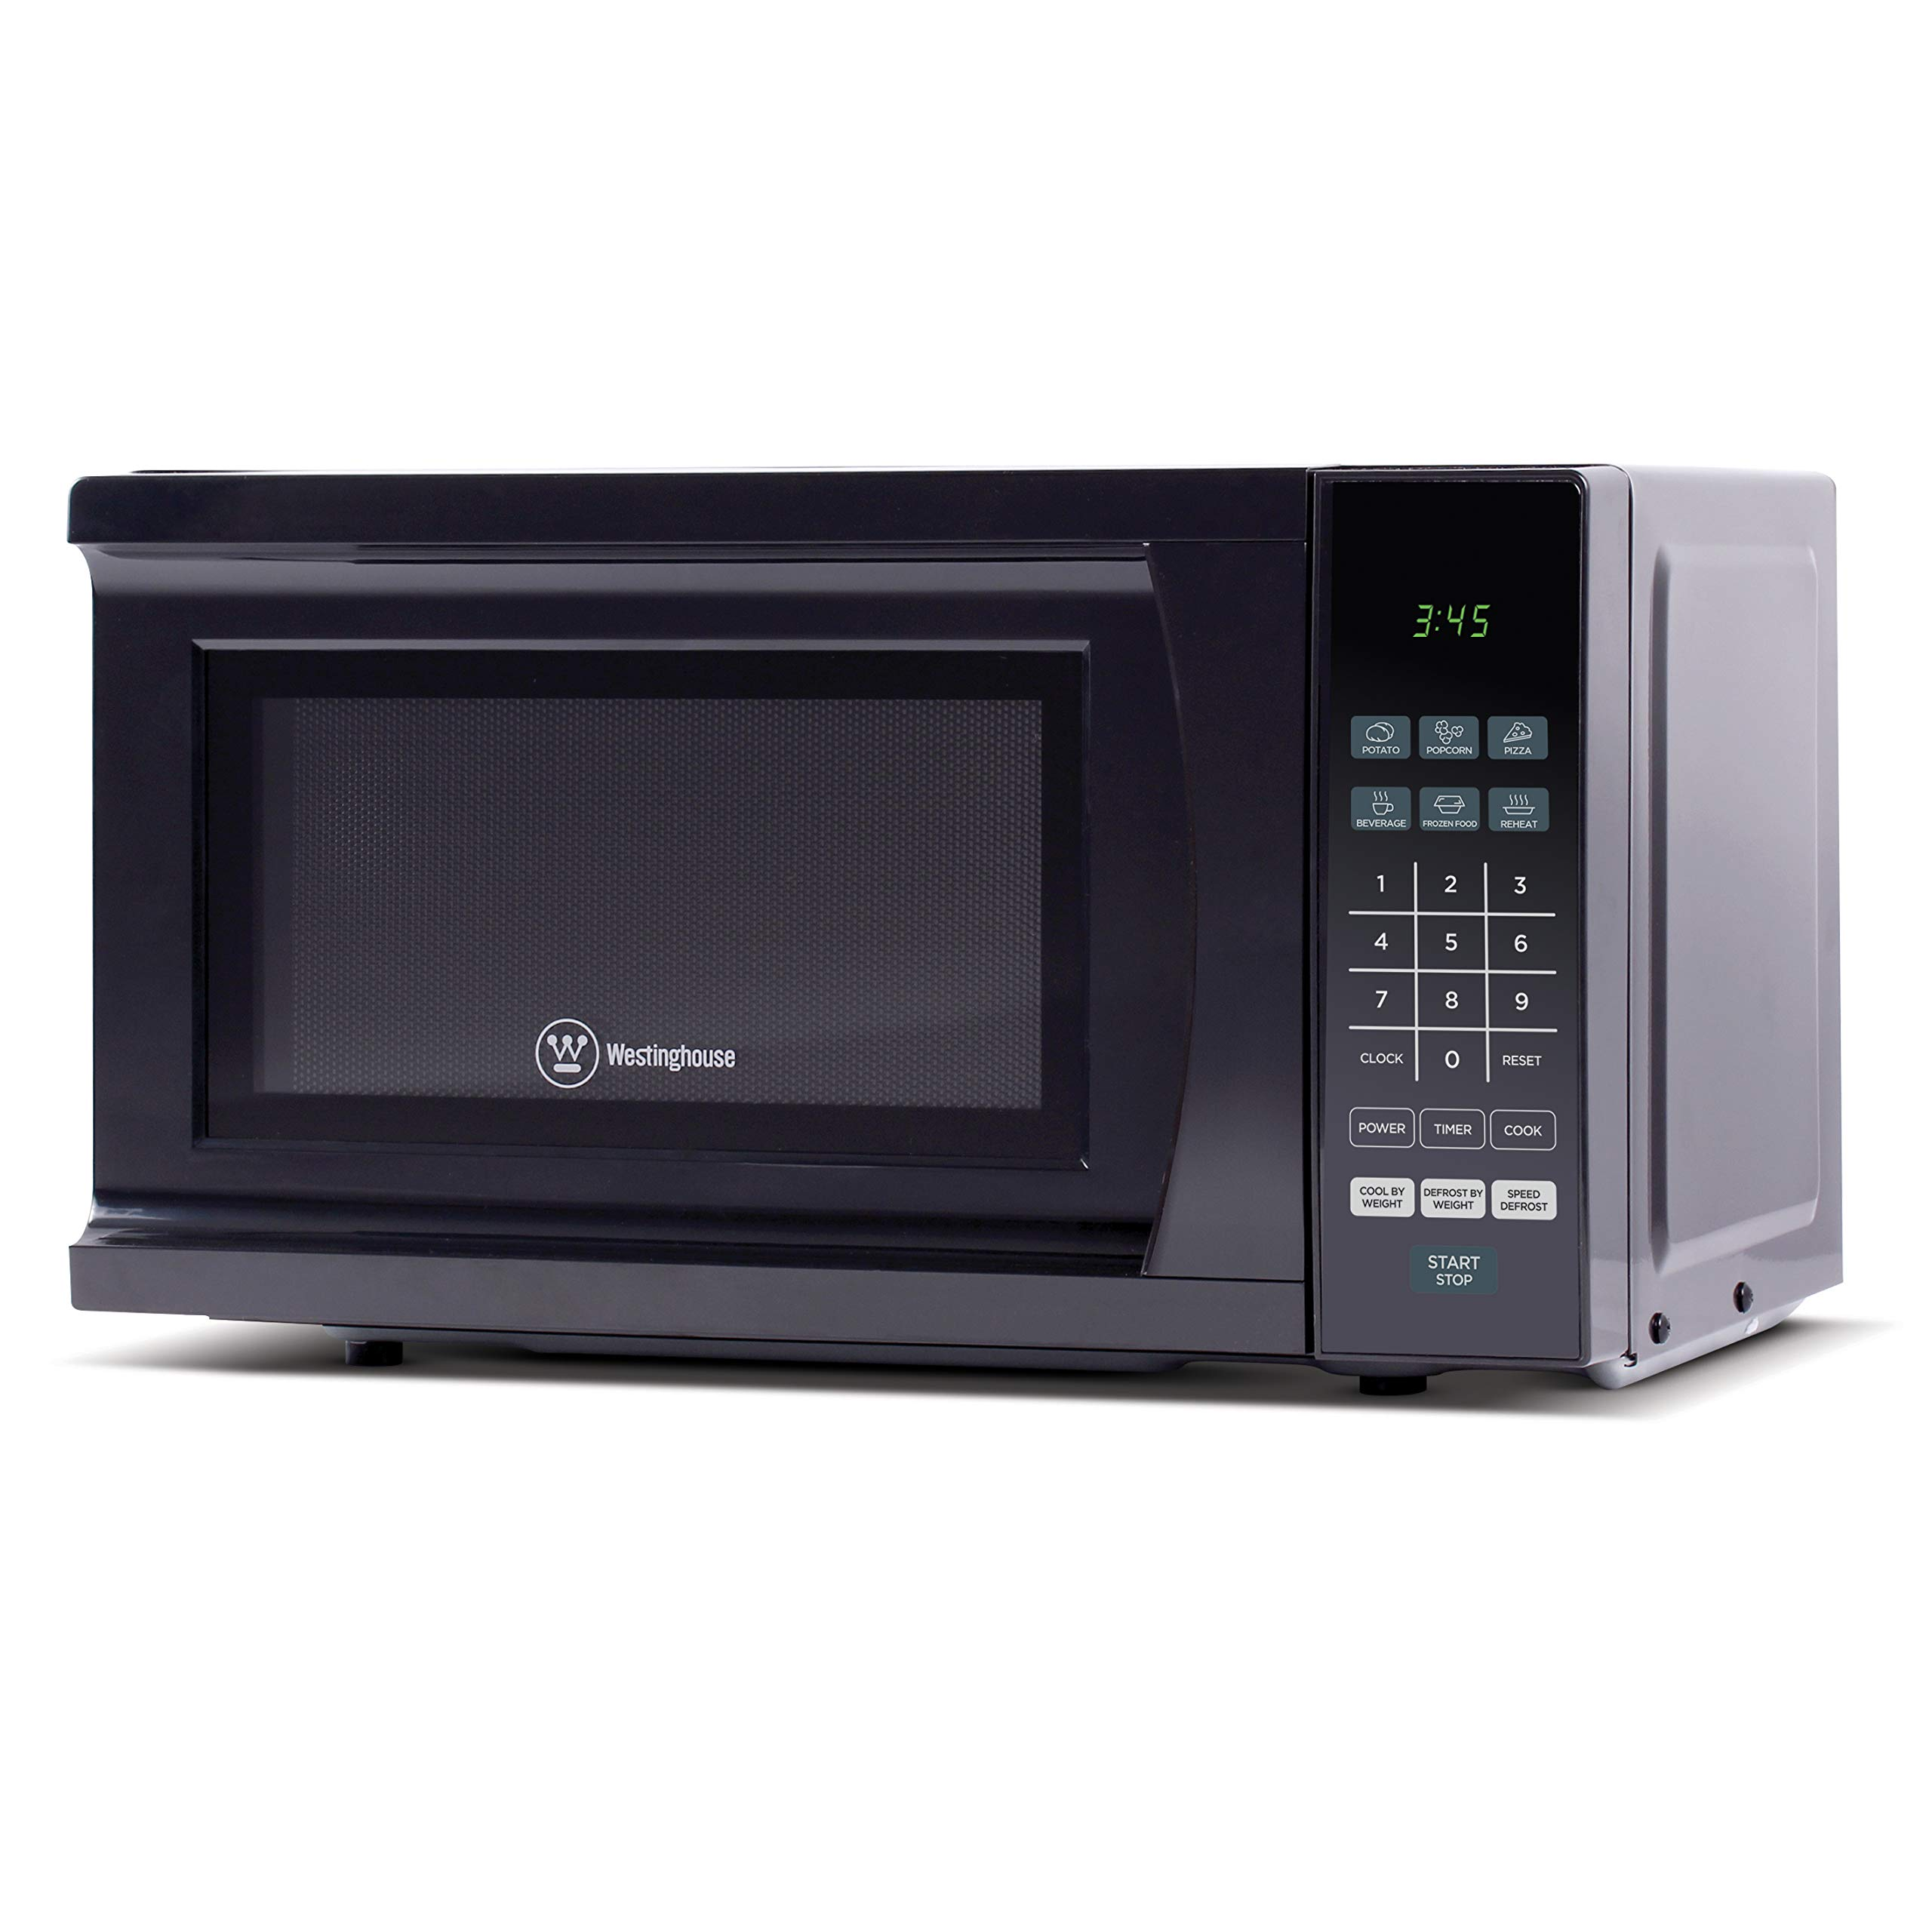 Westinghouse 700 Watt Counter Top Microwave Oven, 0.7 Cubic Feet, Black, WMM7B